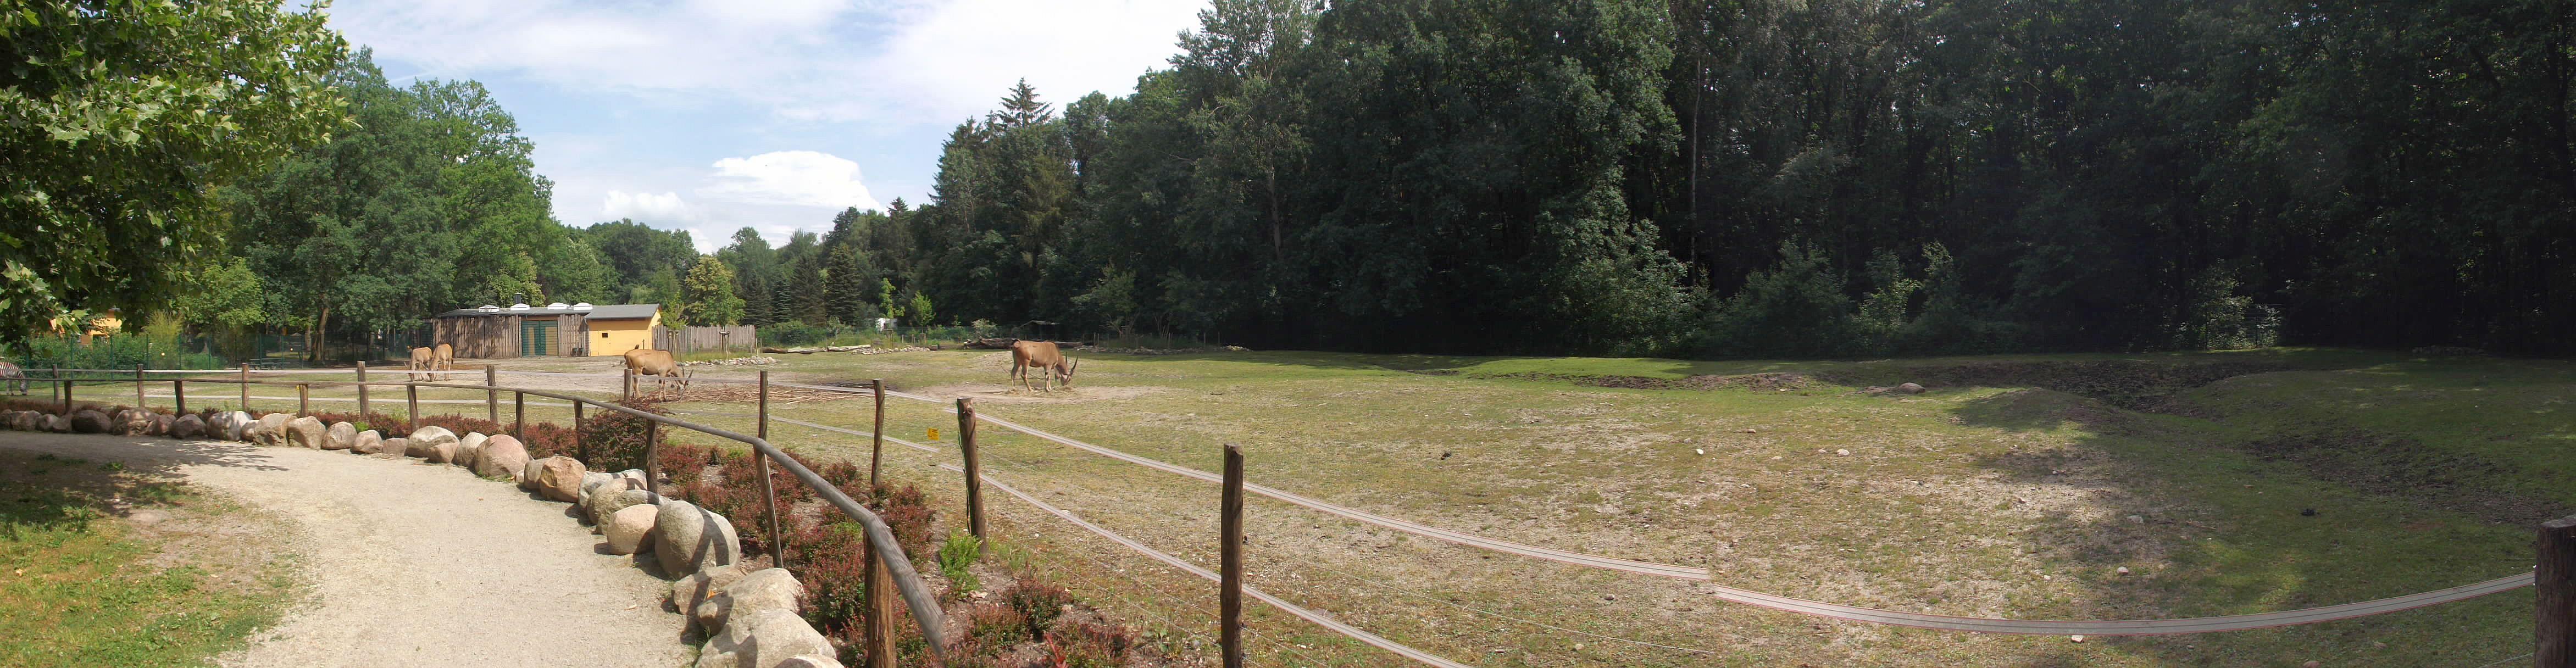 Afrikaanlage (Tierpark Finsterwalde)